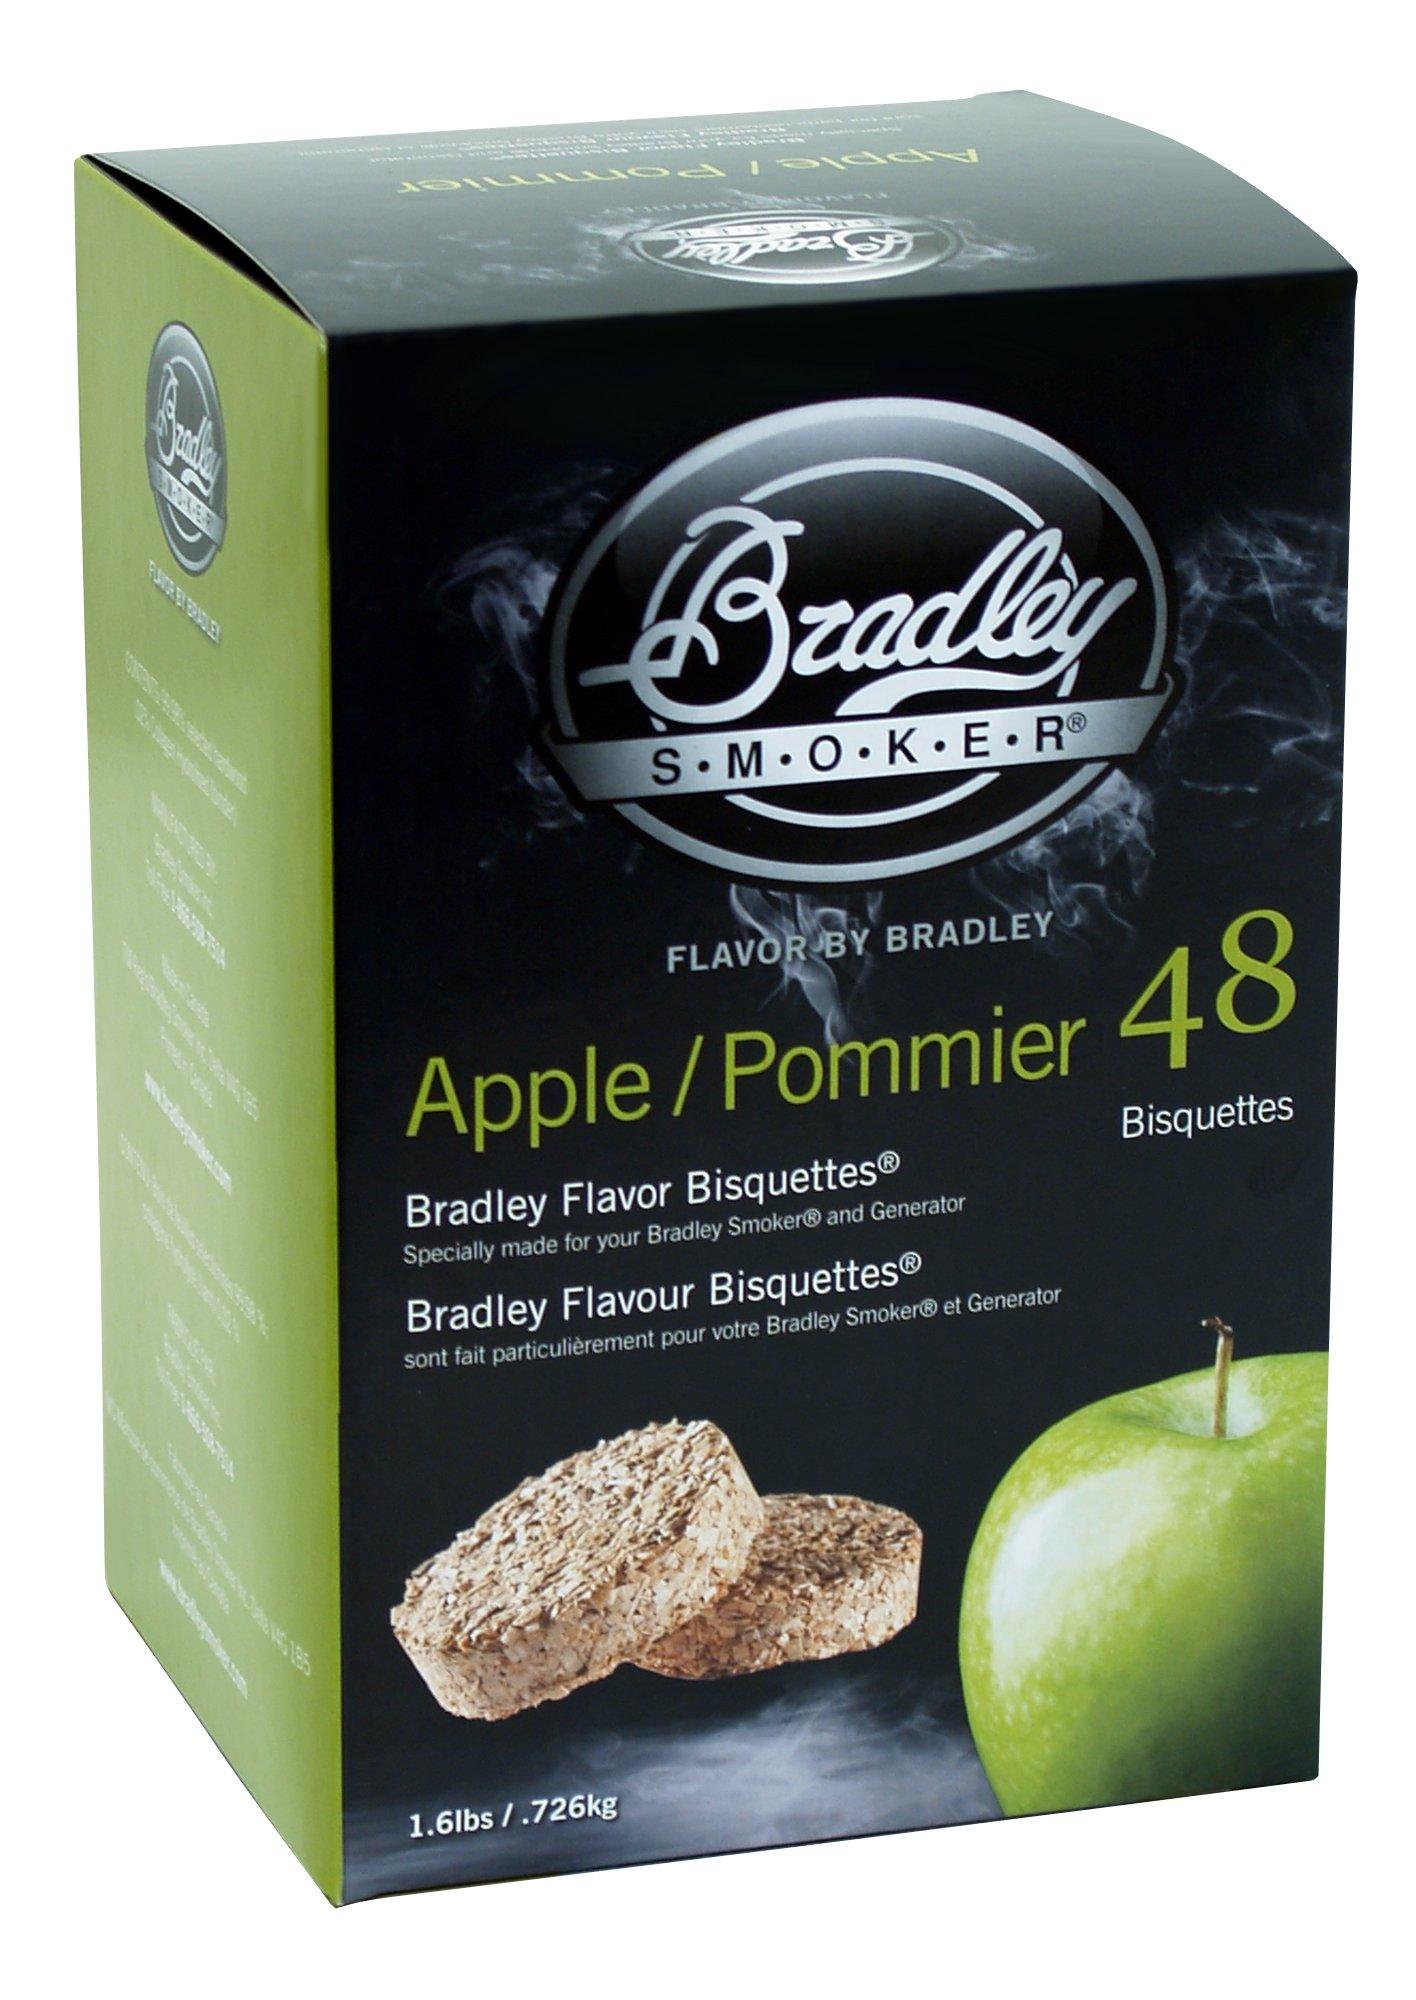 Bradley Smoker BTAP48 Apple/Pommier Bisquettes 48 pack by Bradley Smoker